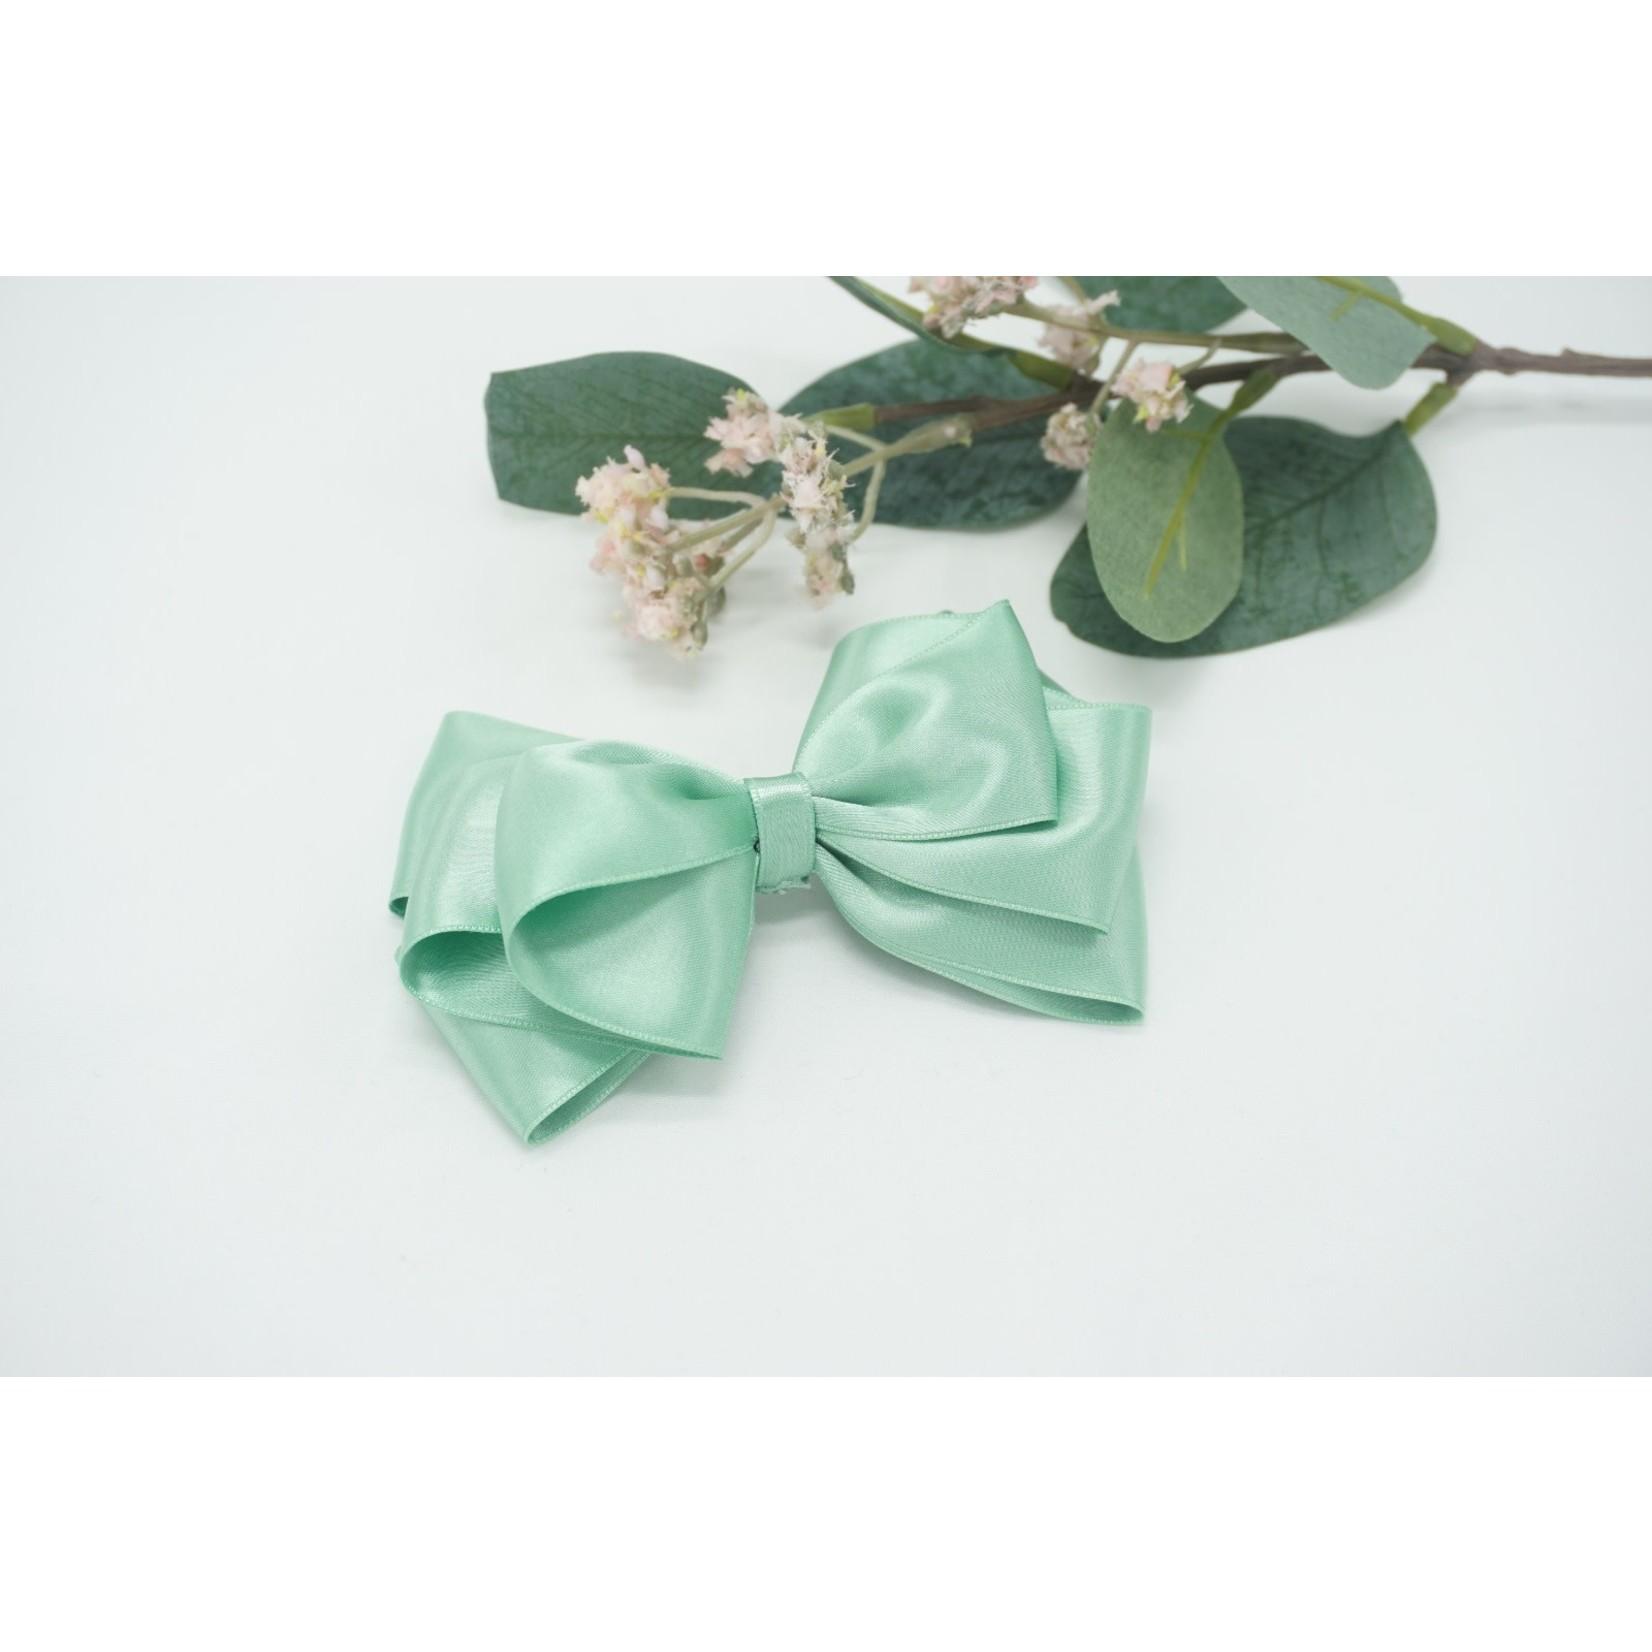 Butterfly Bow - Moss Green 12 cm